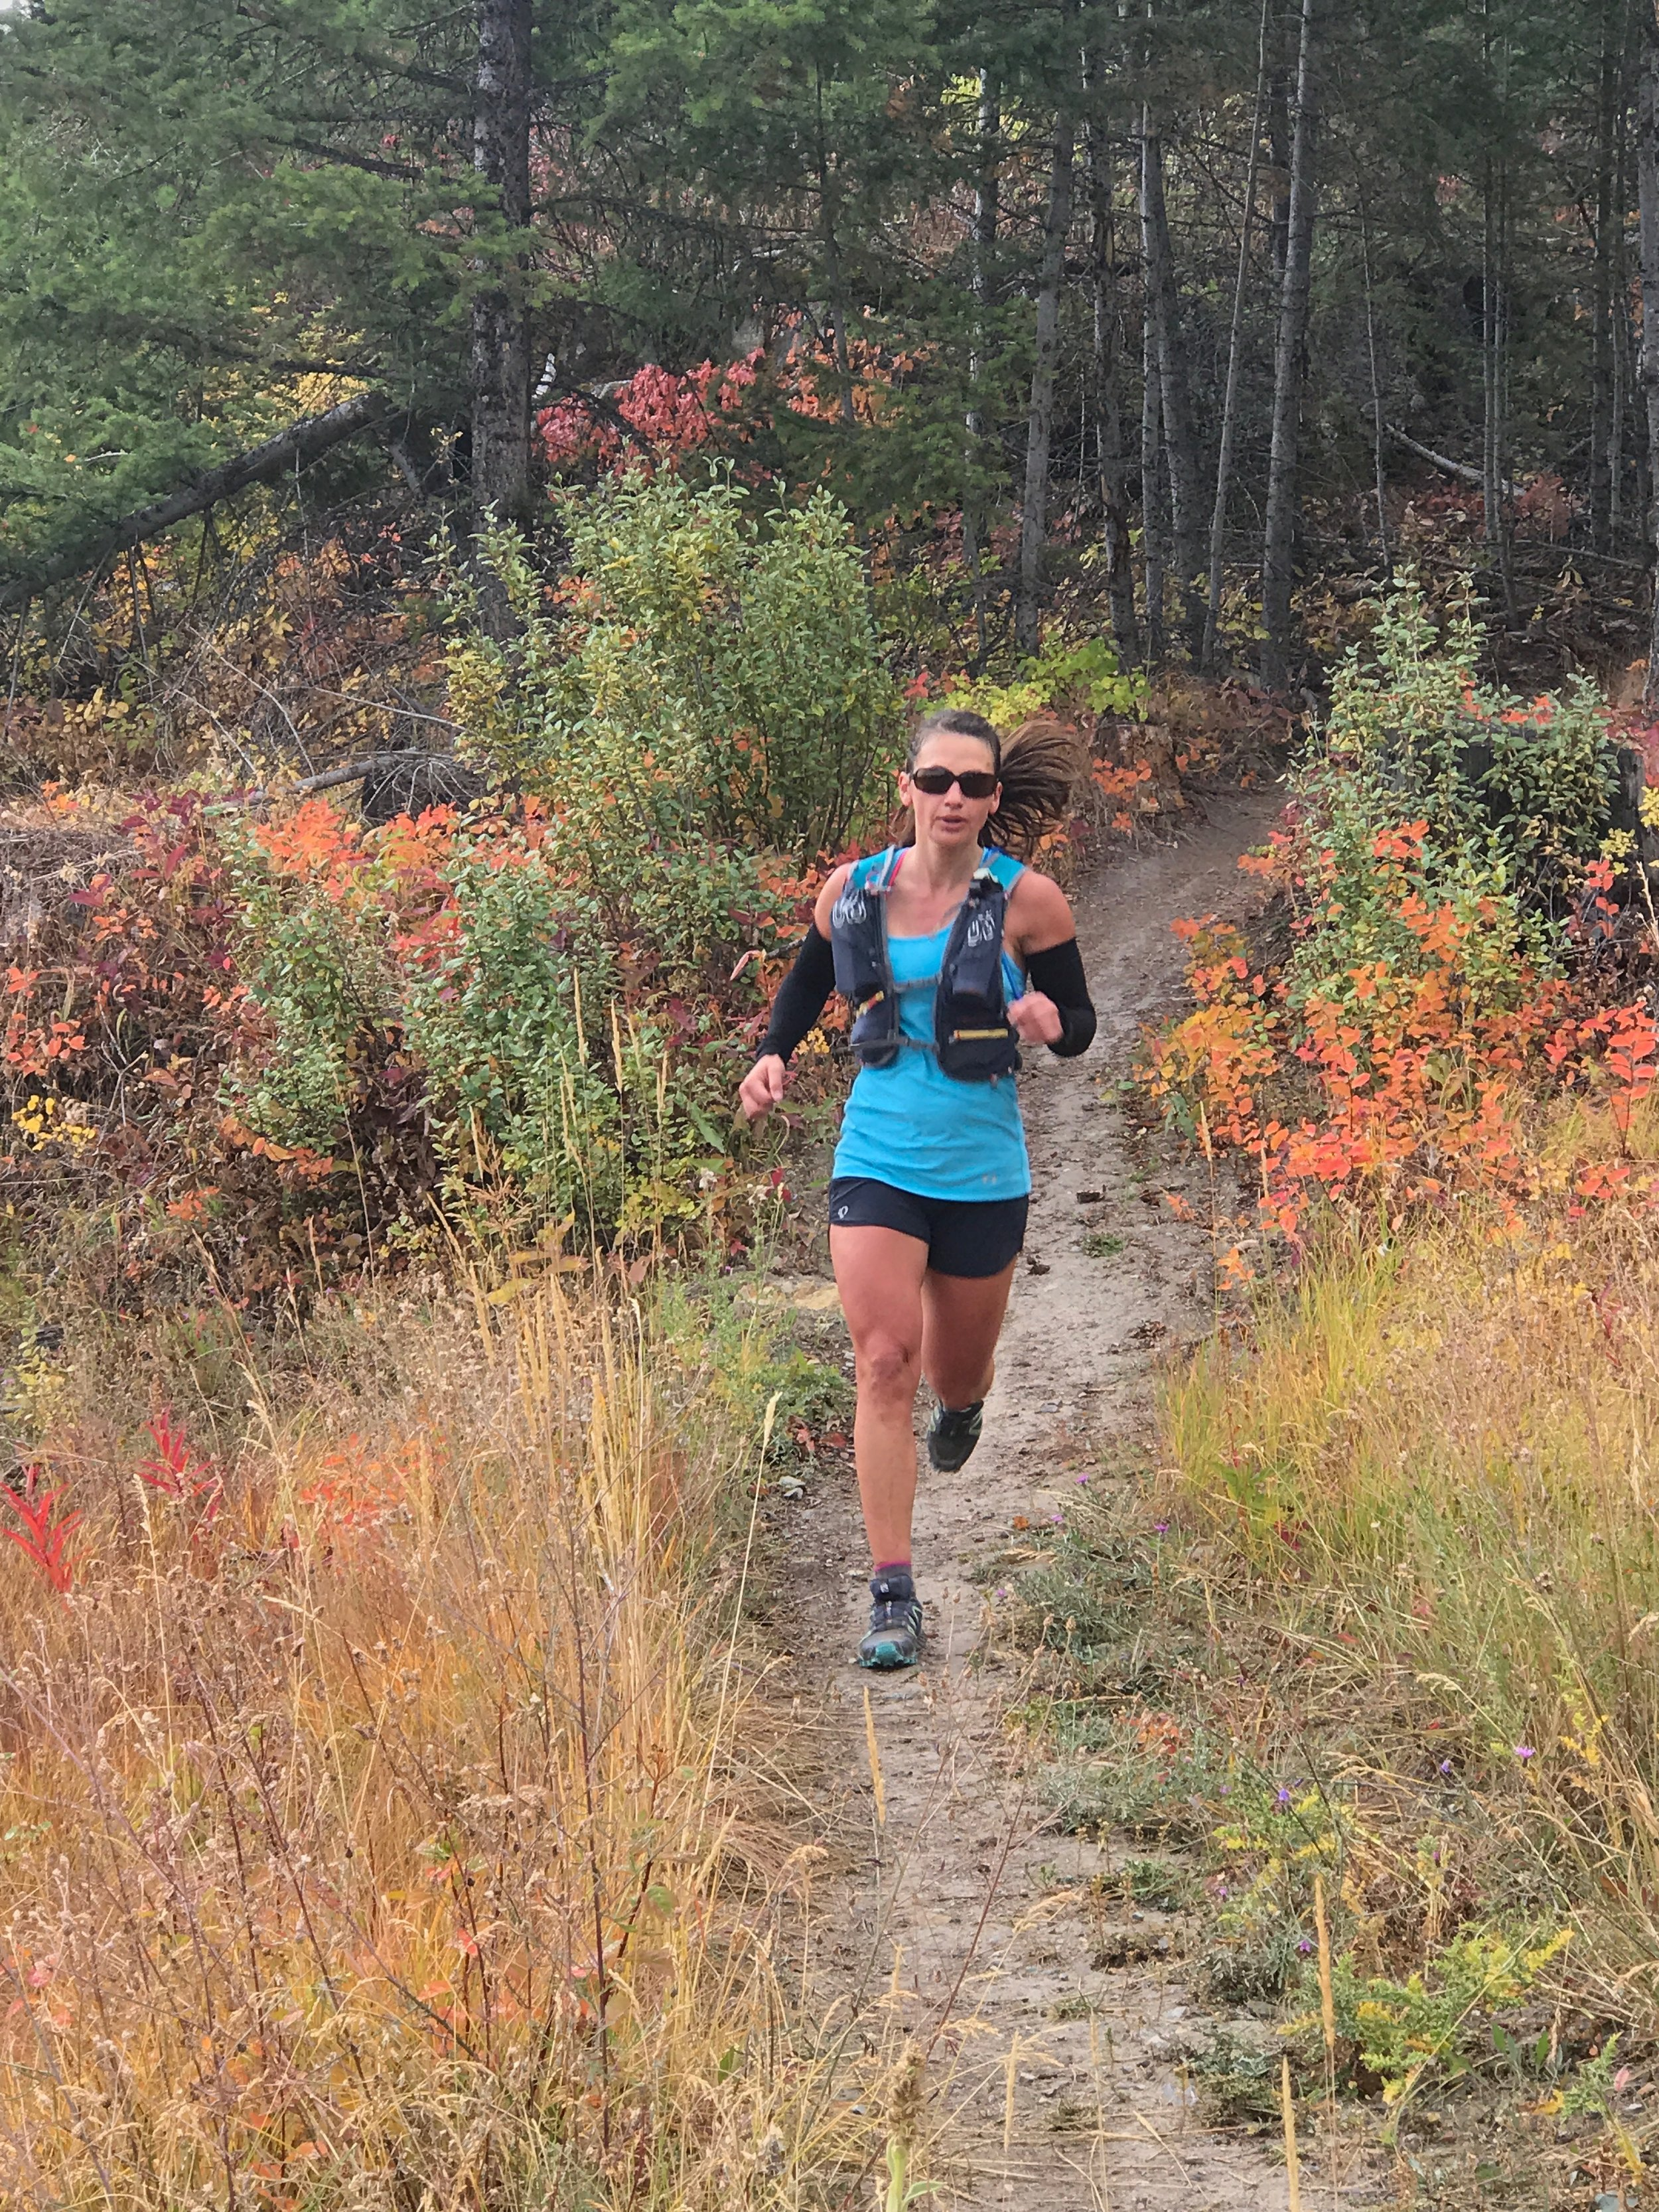 foys to blacktail trails trail marathon ftbtIMG_1754.JPG